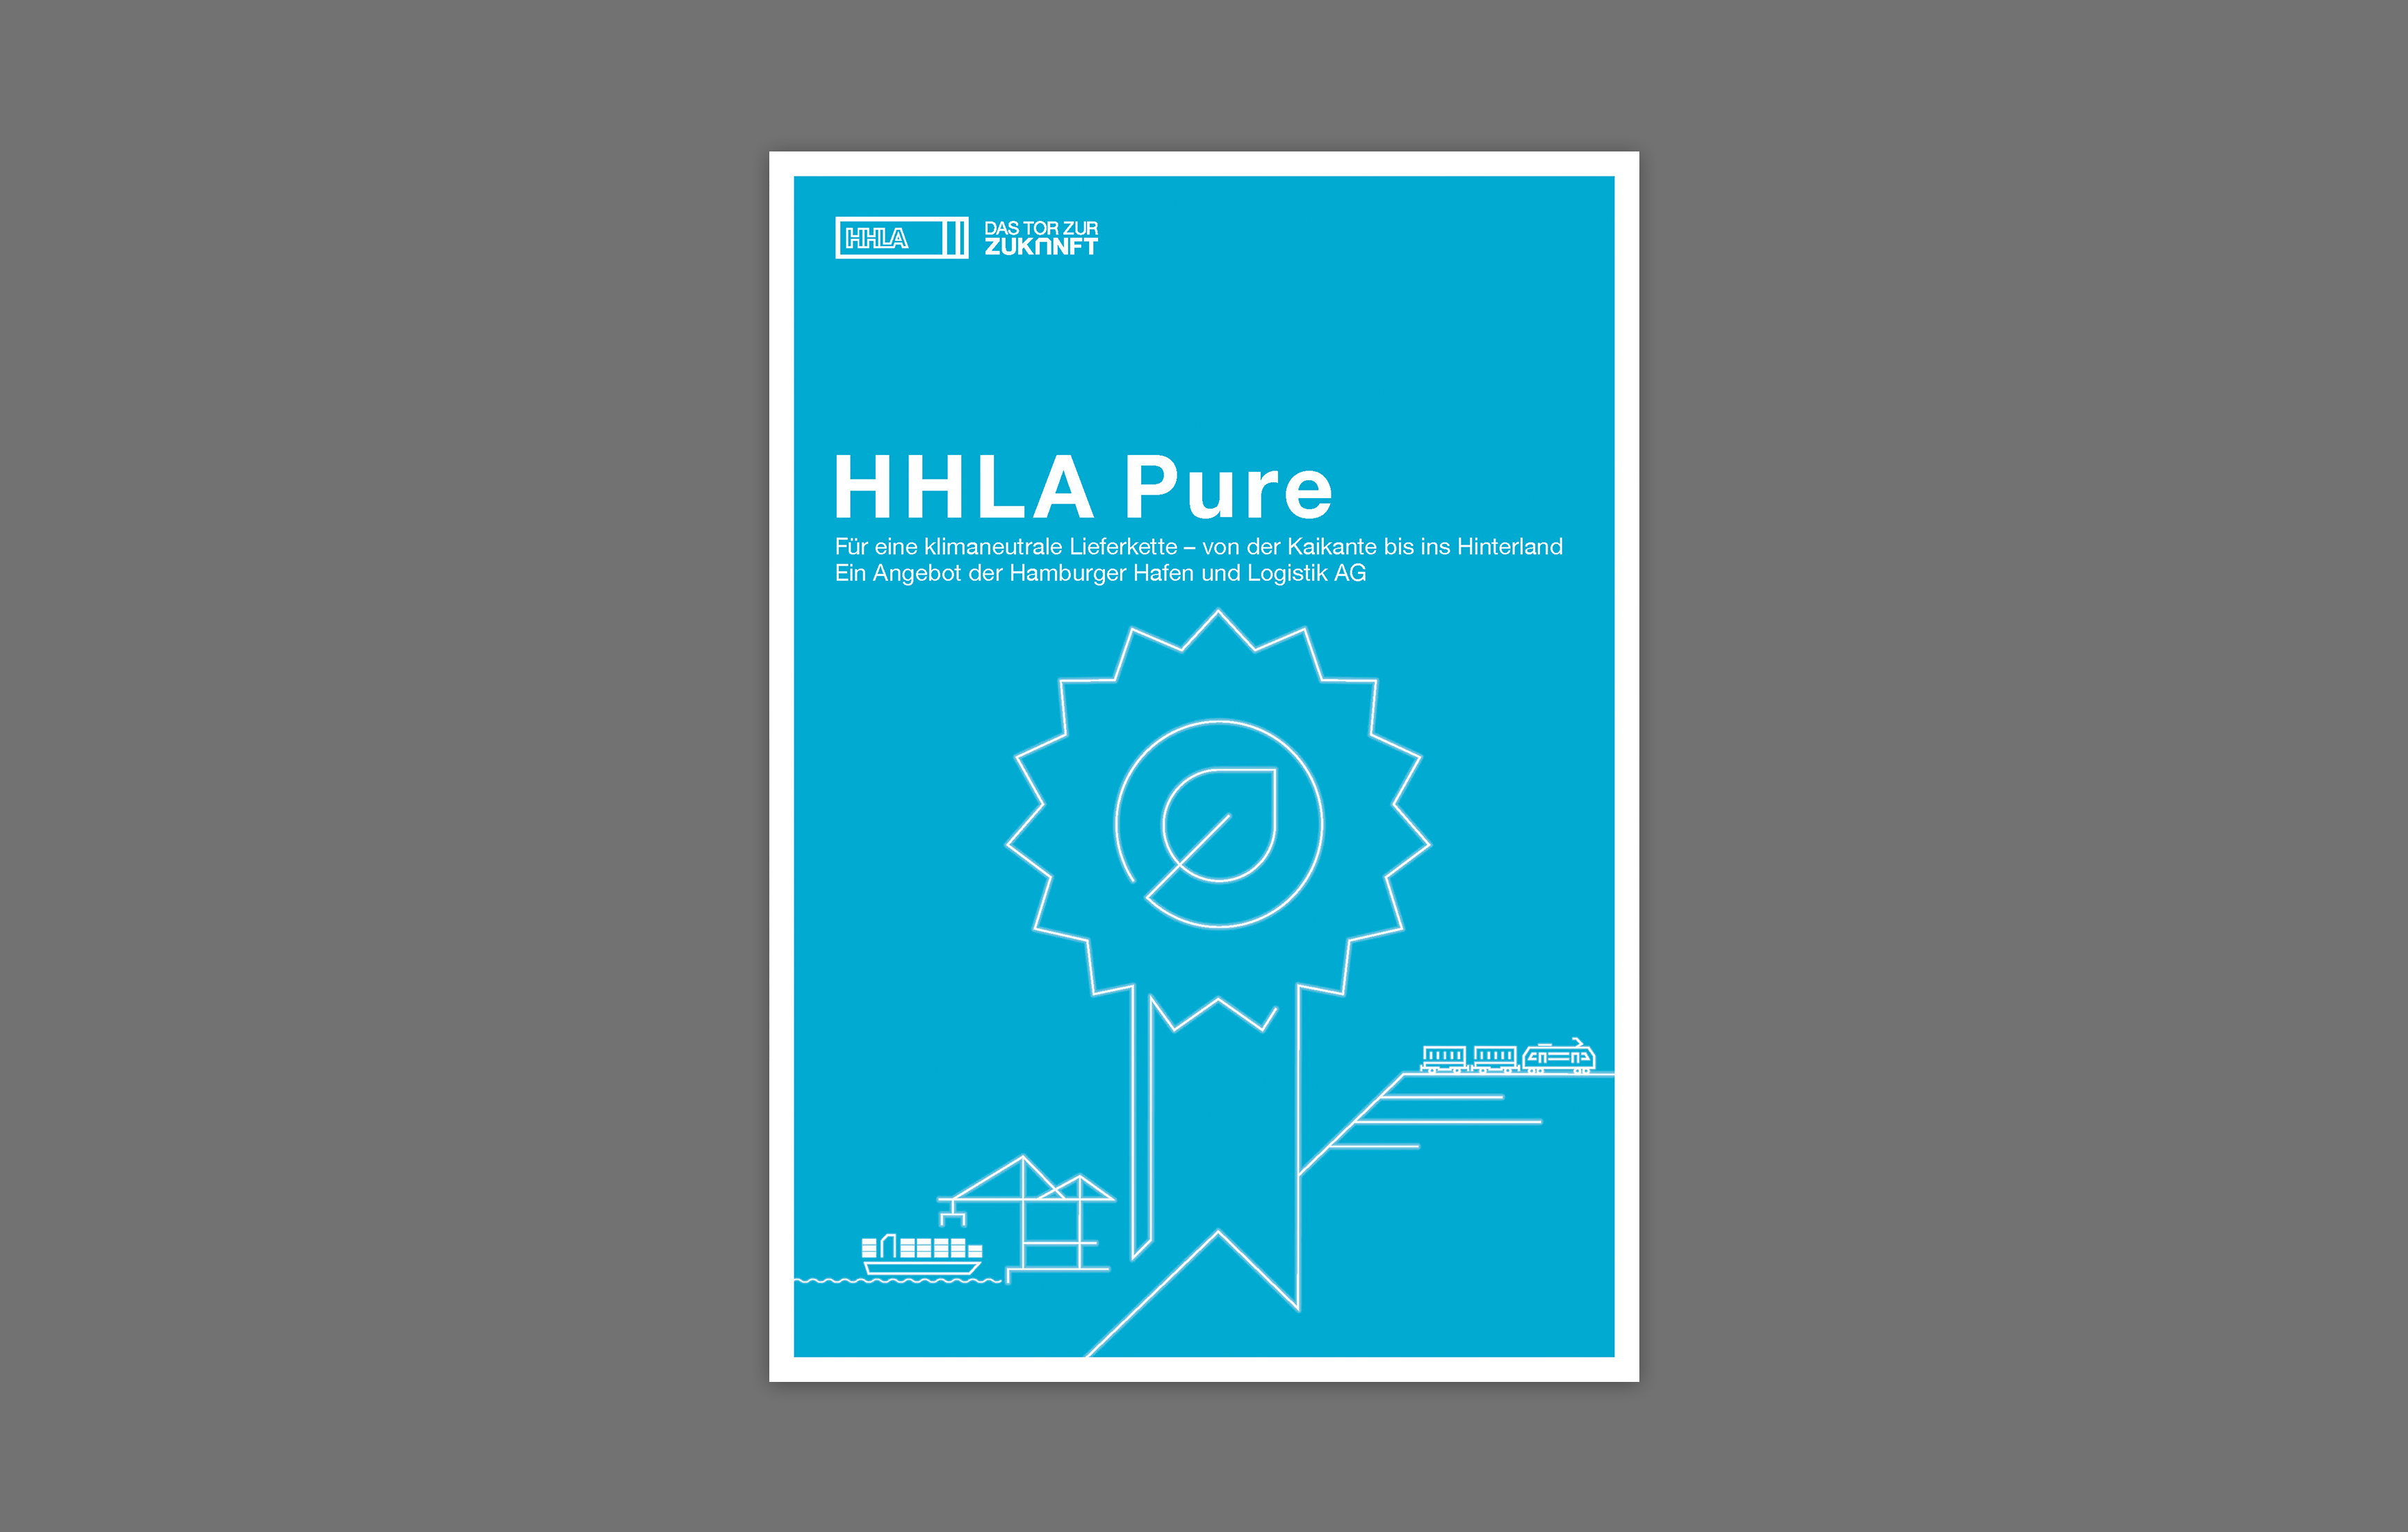 HHLA_Pure_Cover_HG